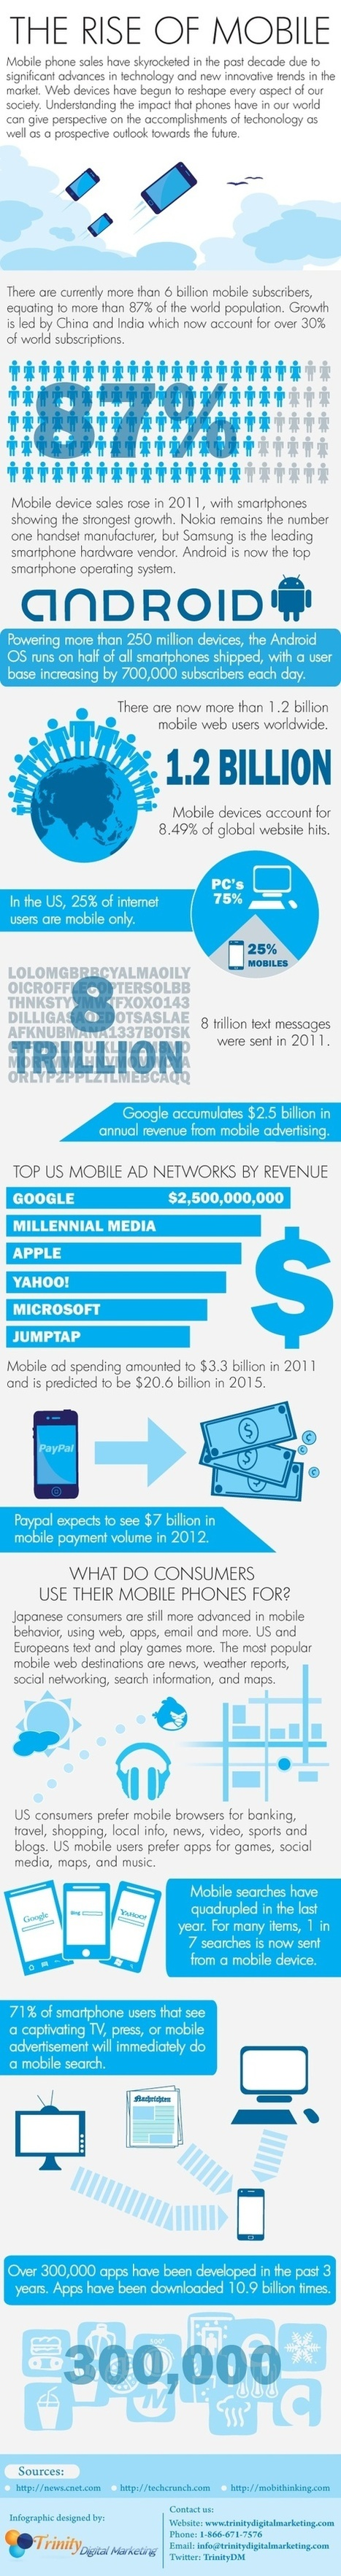 Mobility Infographics | #ICT news #Cloud #Management #BYOD #BigData #Social Media #Technologies | Scoop.it